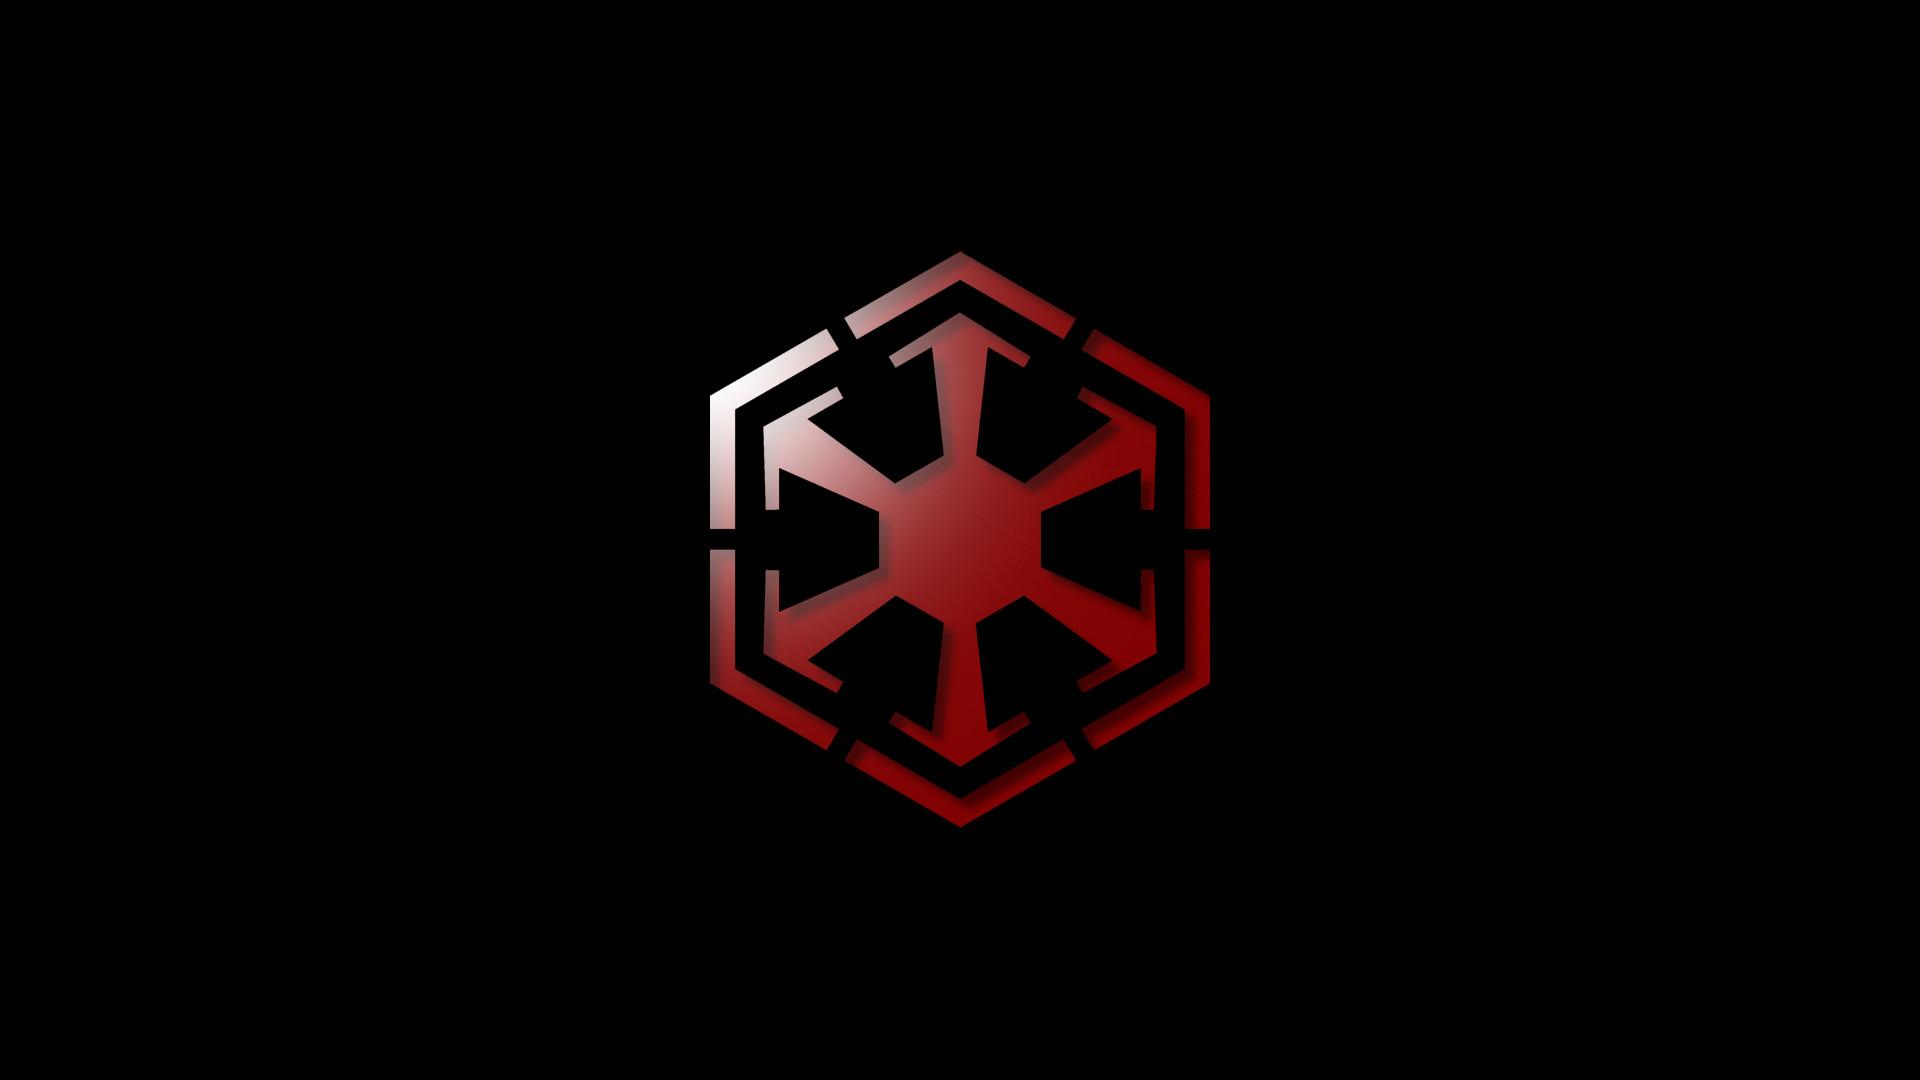 Sith Symbol Wallpaper 74 Images